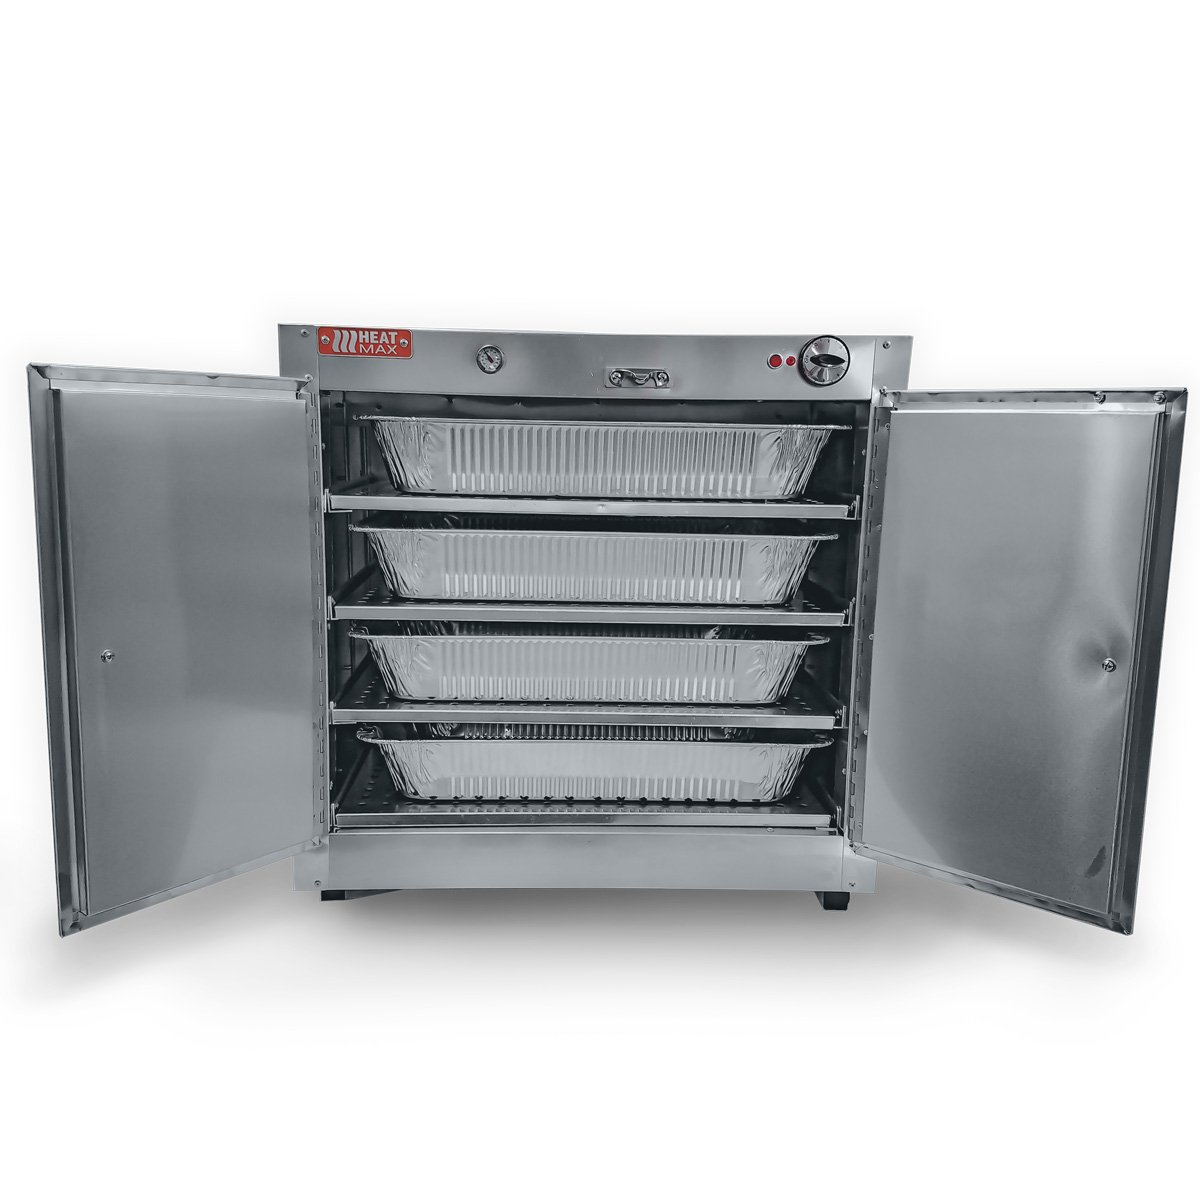 HeatMax Commercial Countertop Hot Box Cabinet Food Warmer 25x15x24 Display